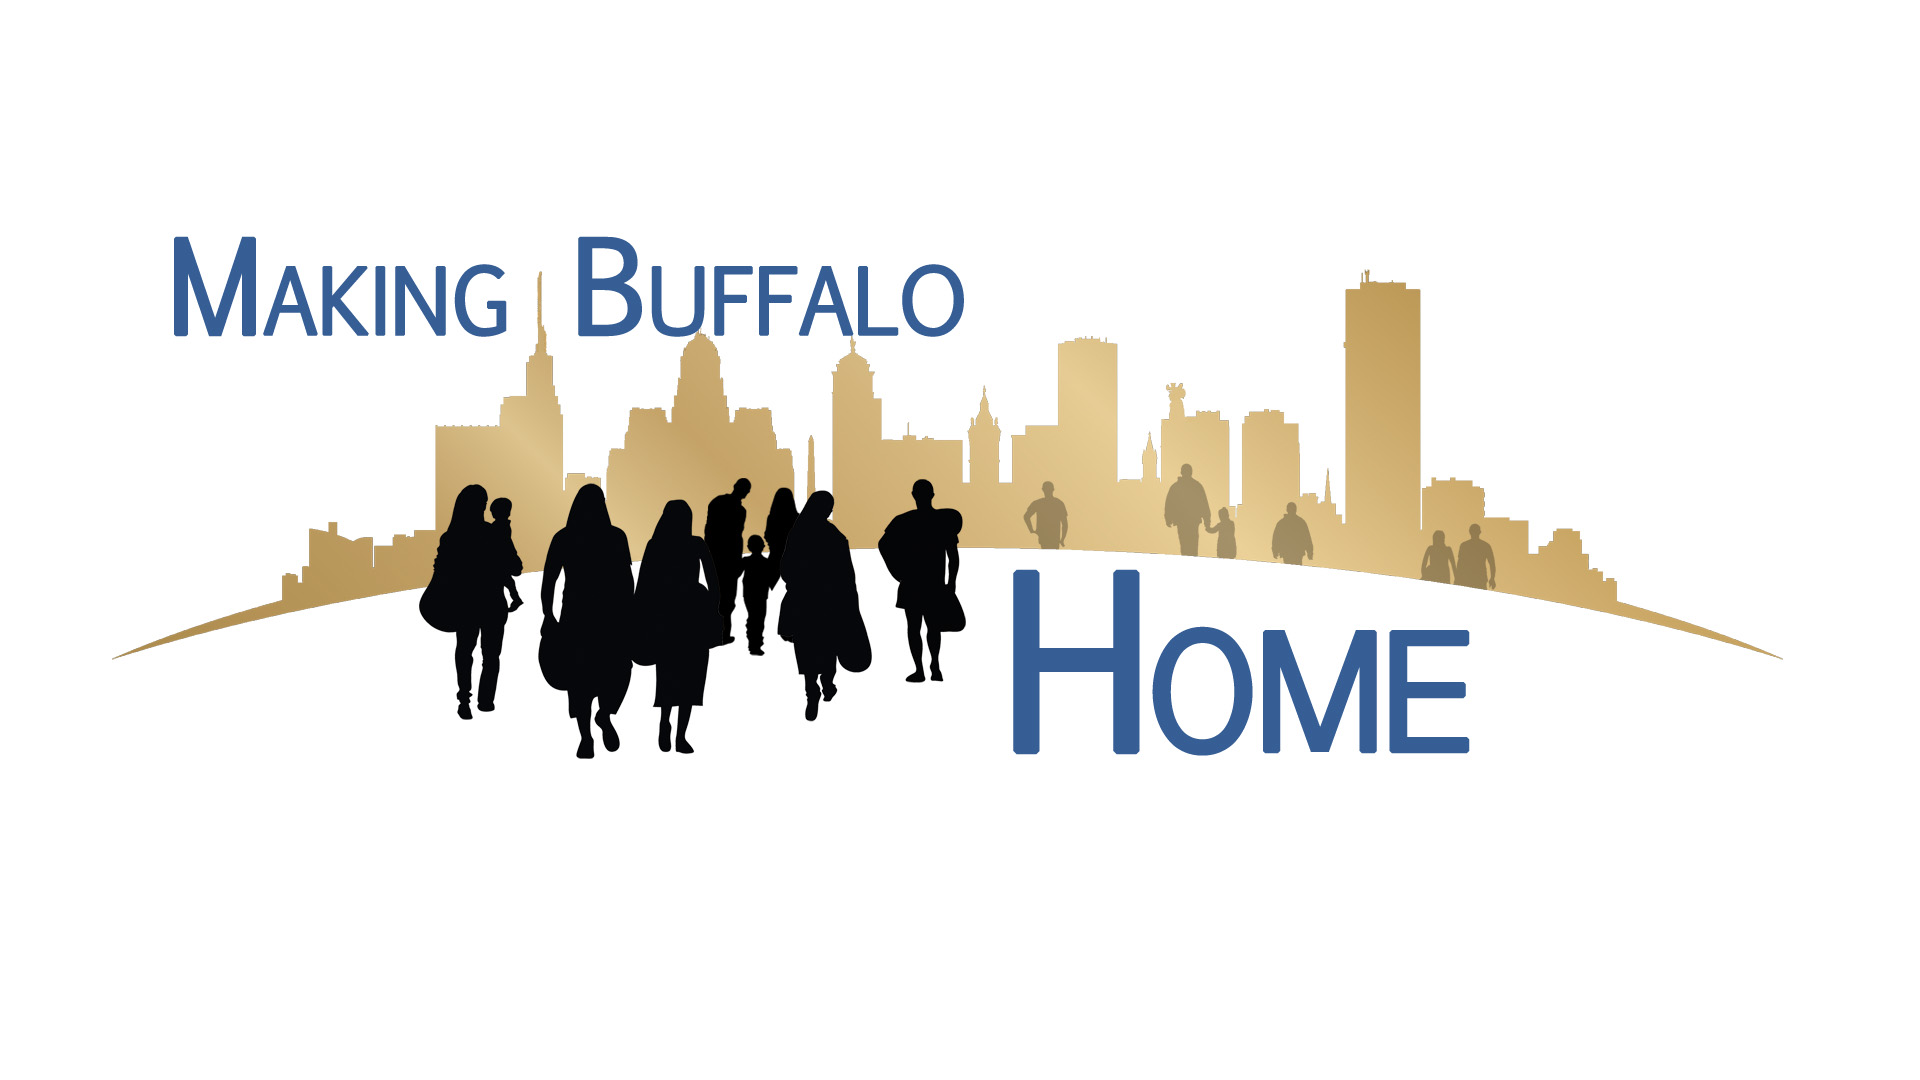 Making Buffalo Home